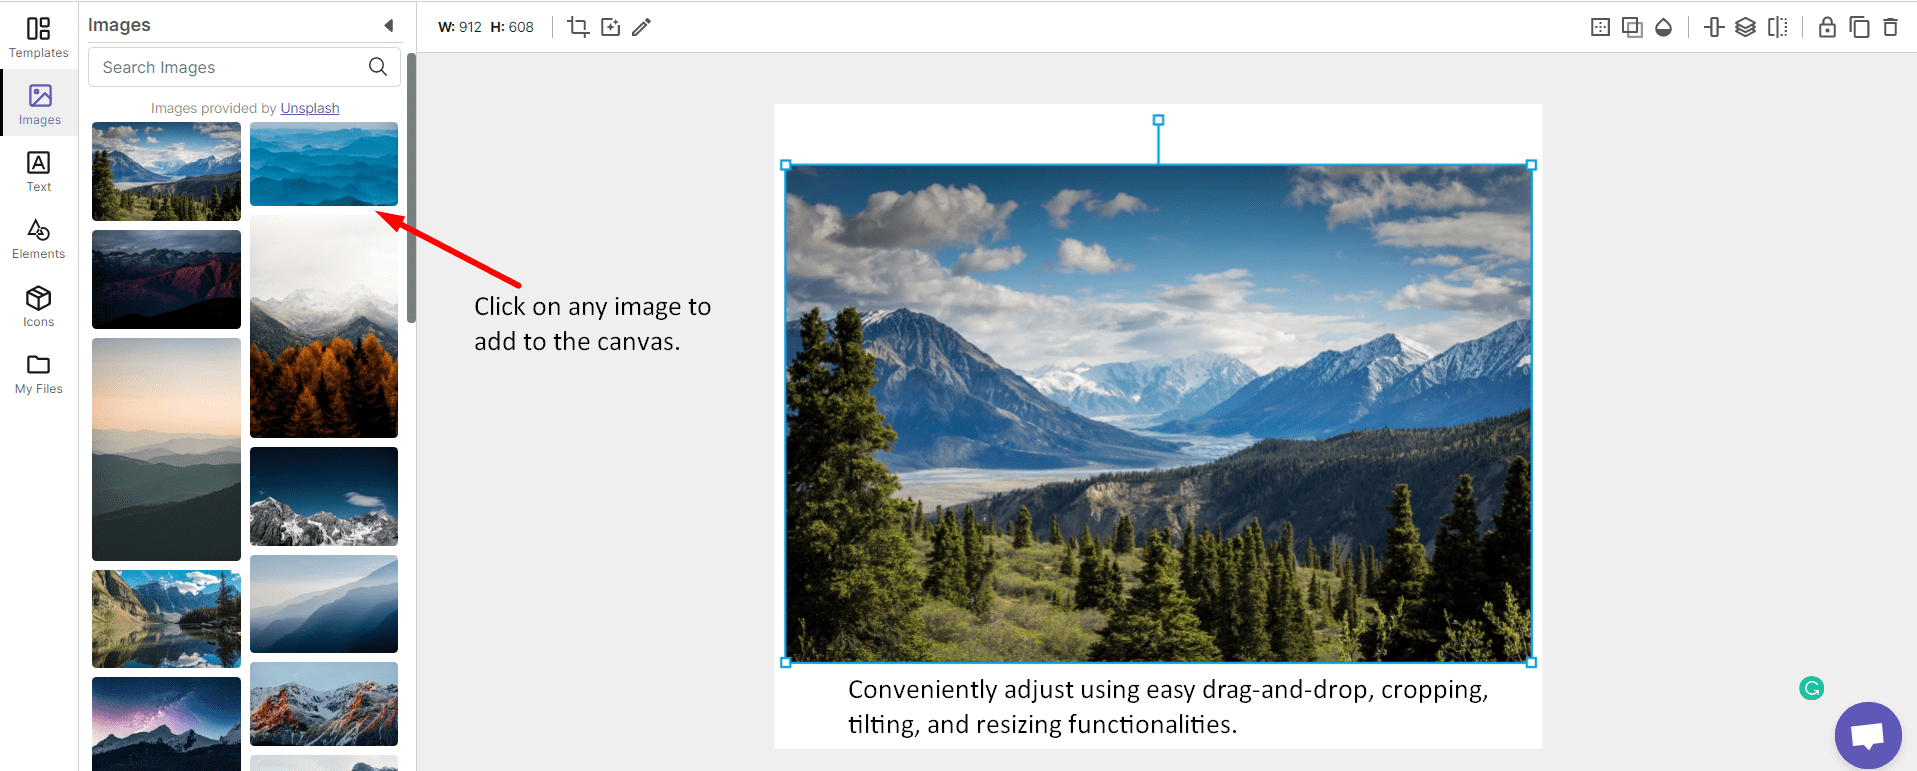 pixelied-social-media-design-stock-images